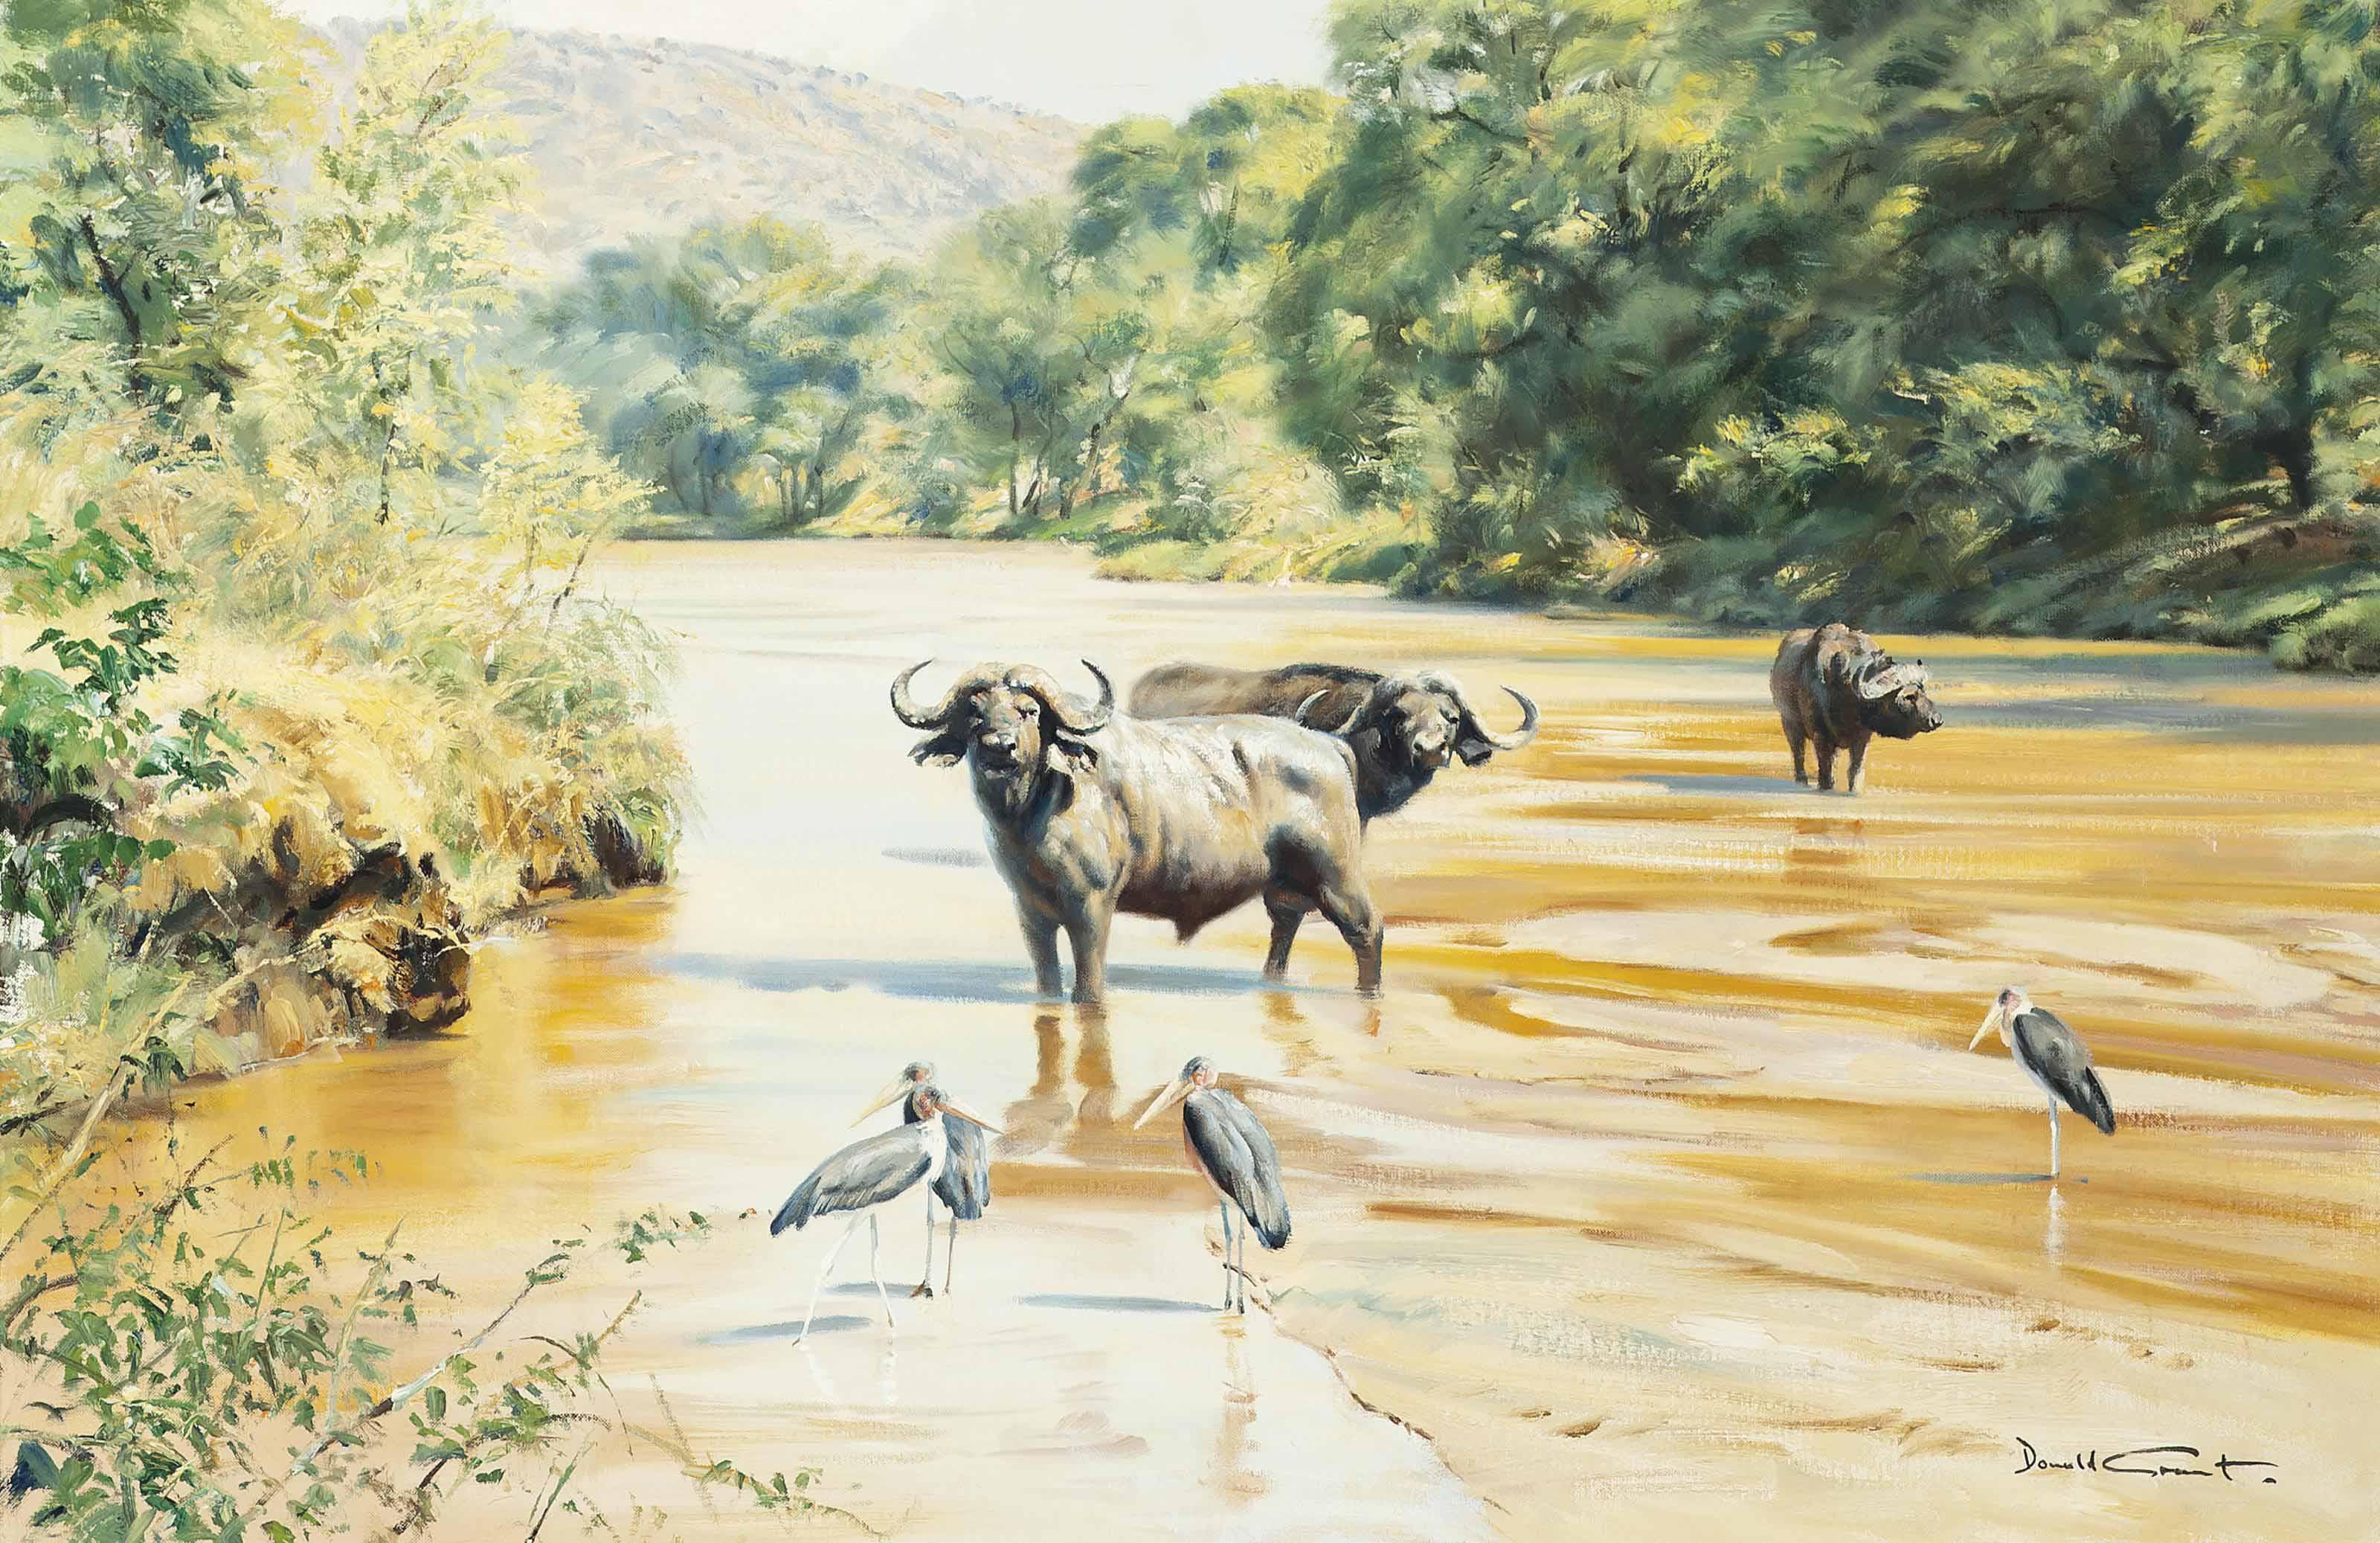 Cape buffalo with maribou stork